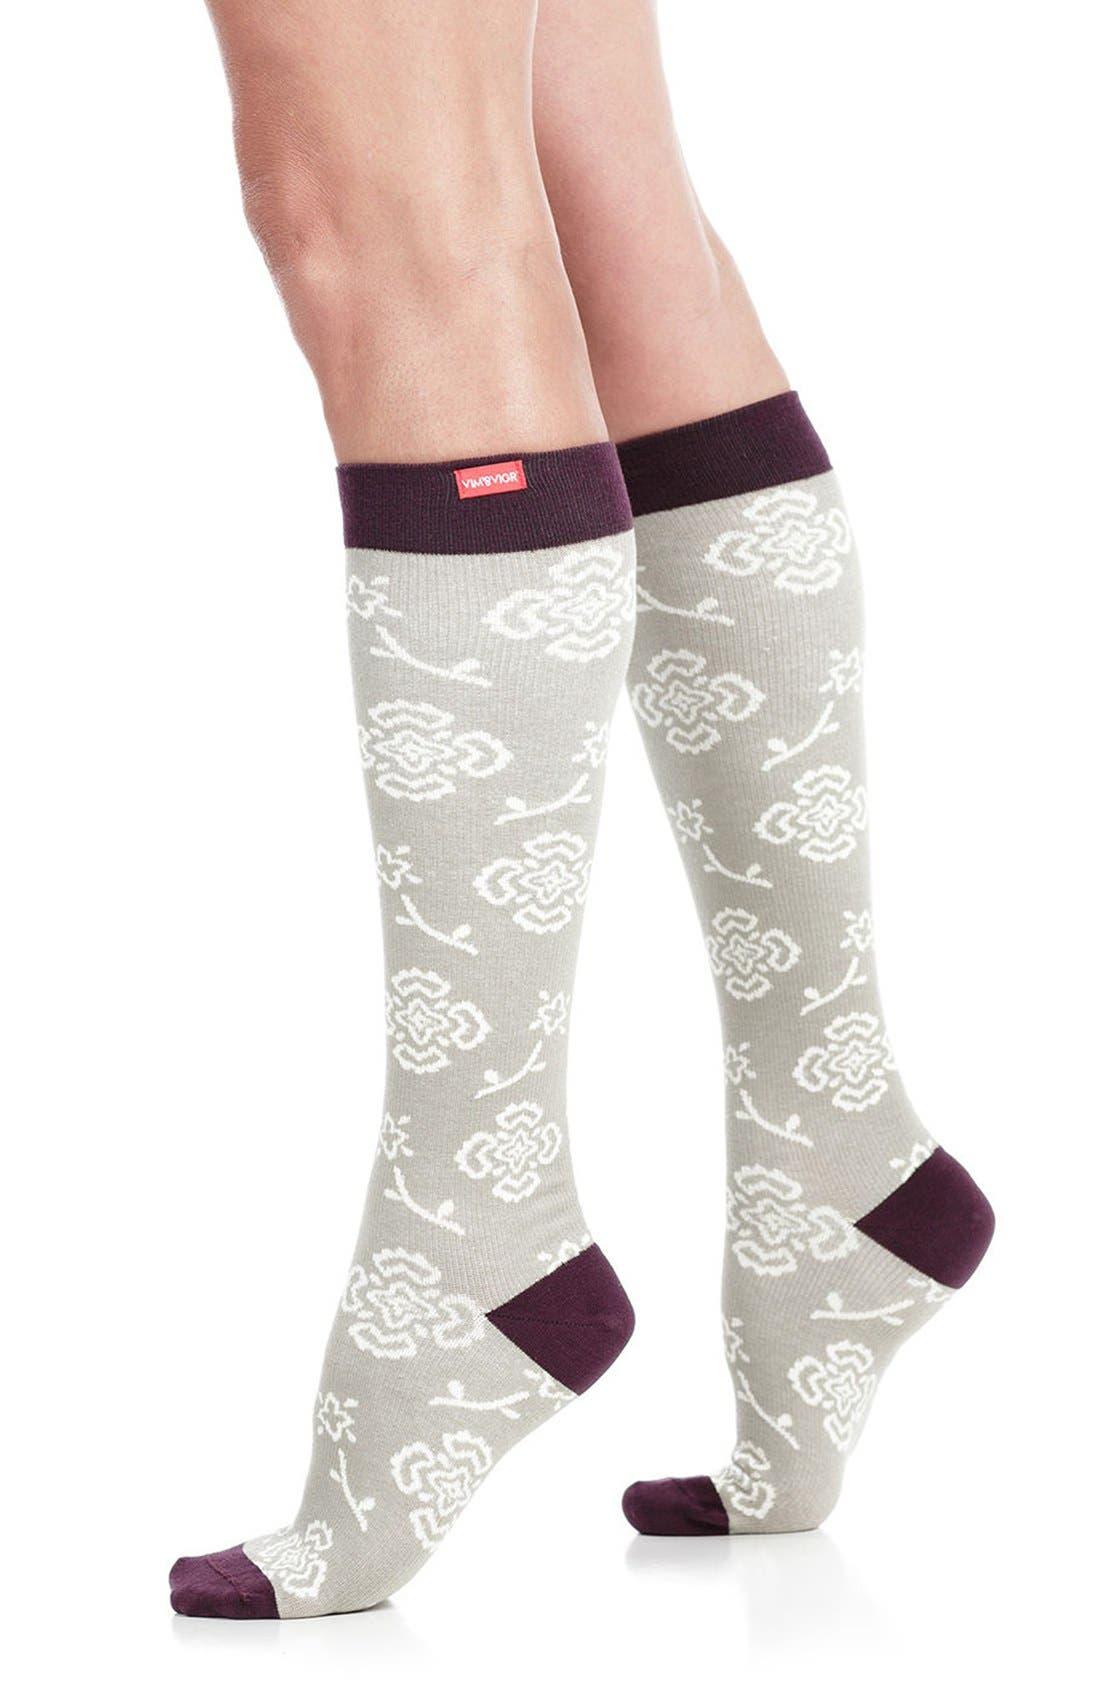 Queen's Floral Compression Trouser Socks,                             Main thumbnail 1, color,                             020